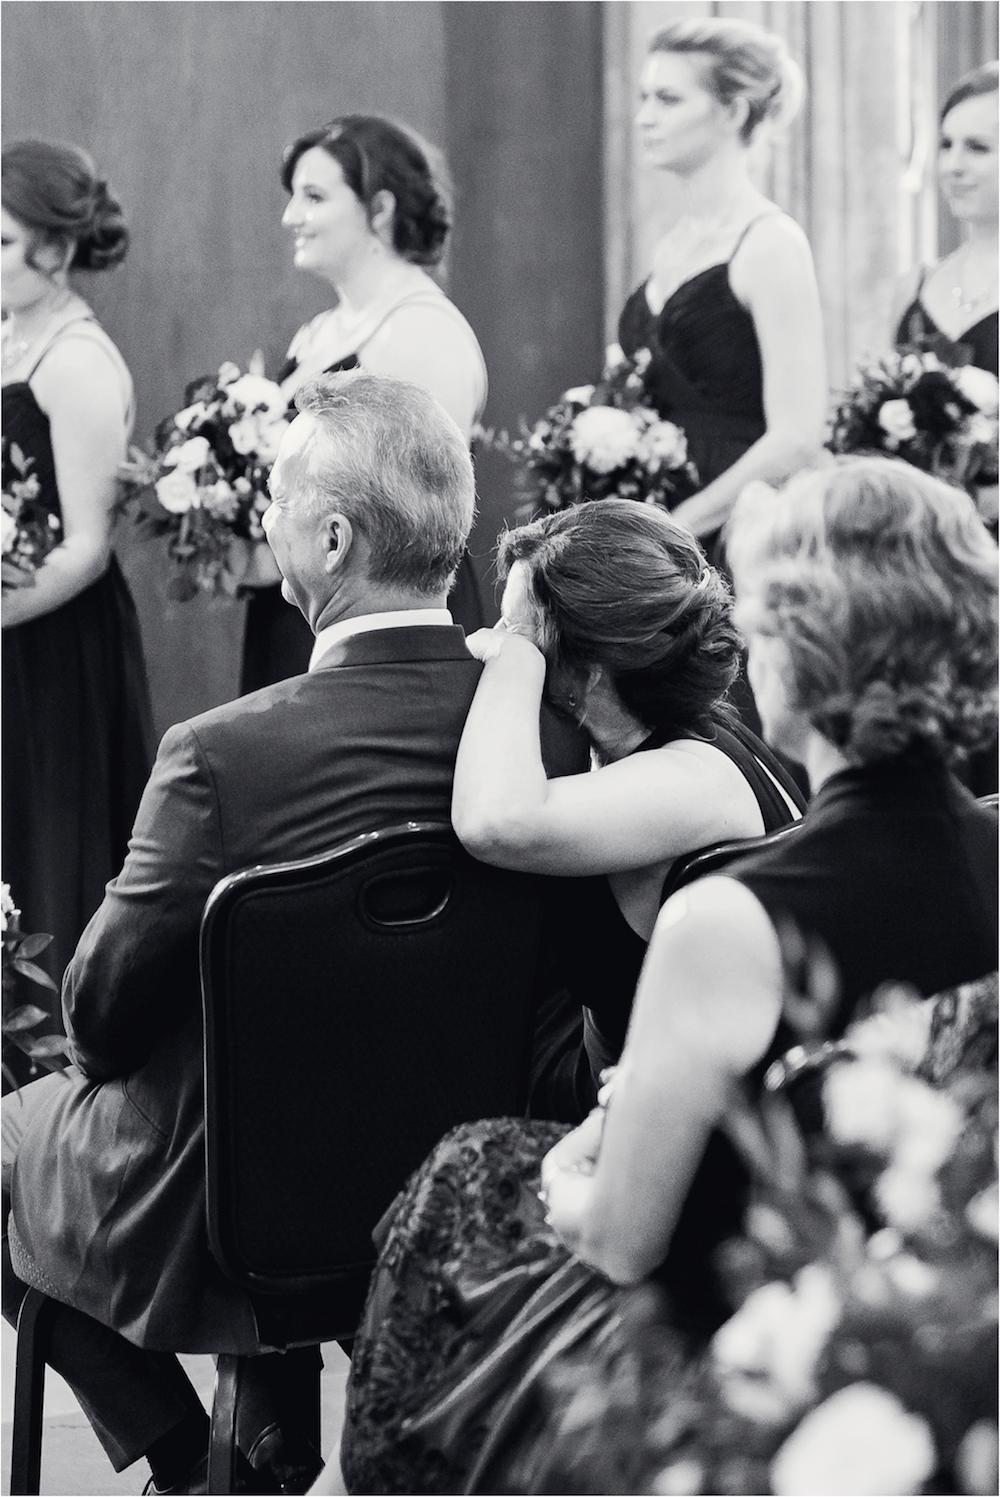 university-of-michigan-museum-art-ann-arbor-umma-wedding-photo-289.jpg